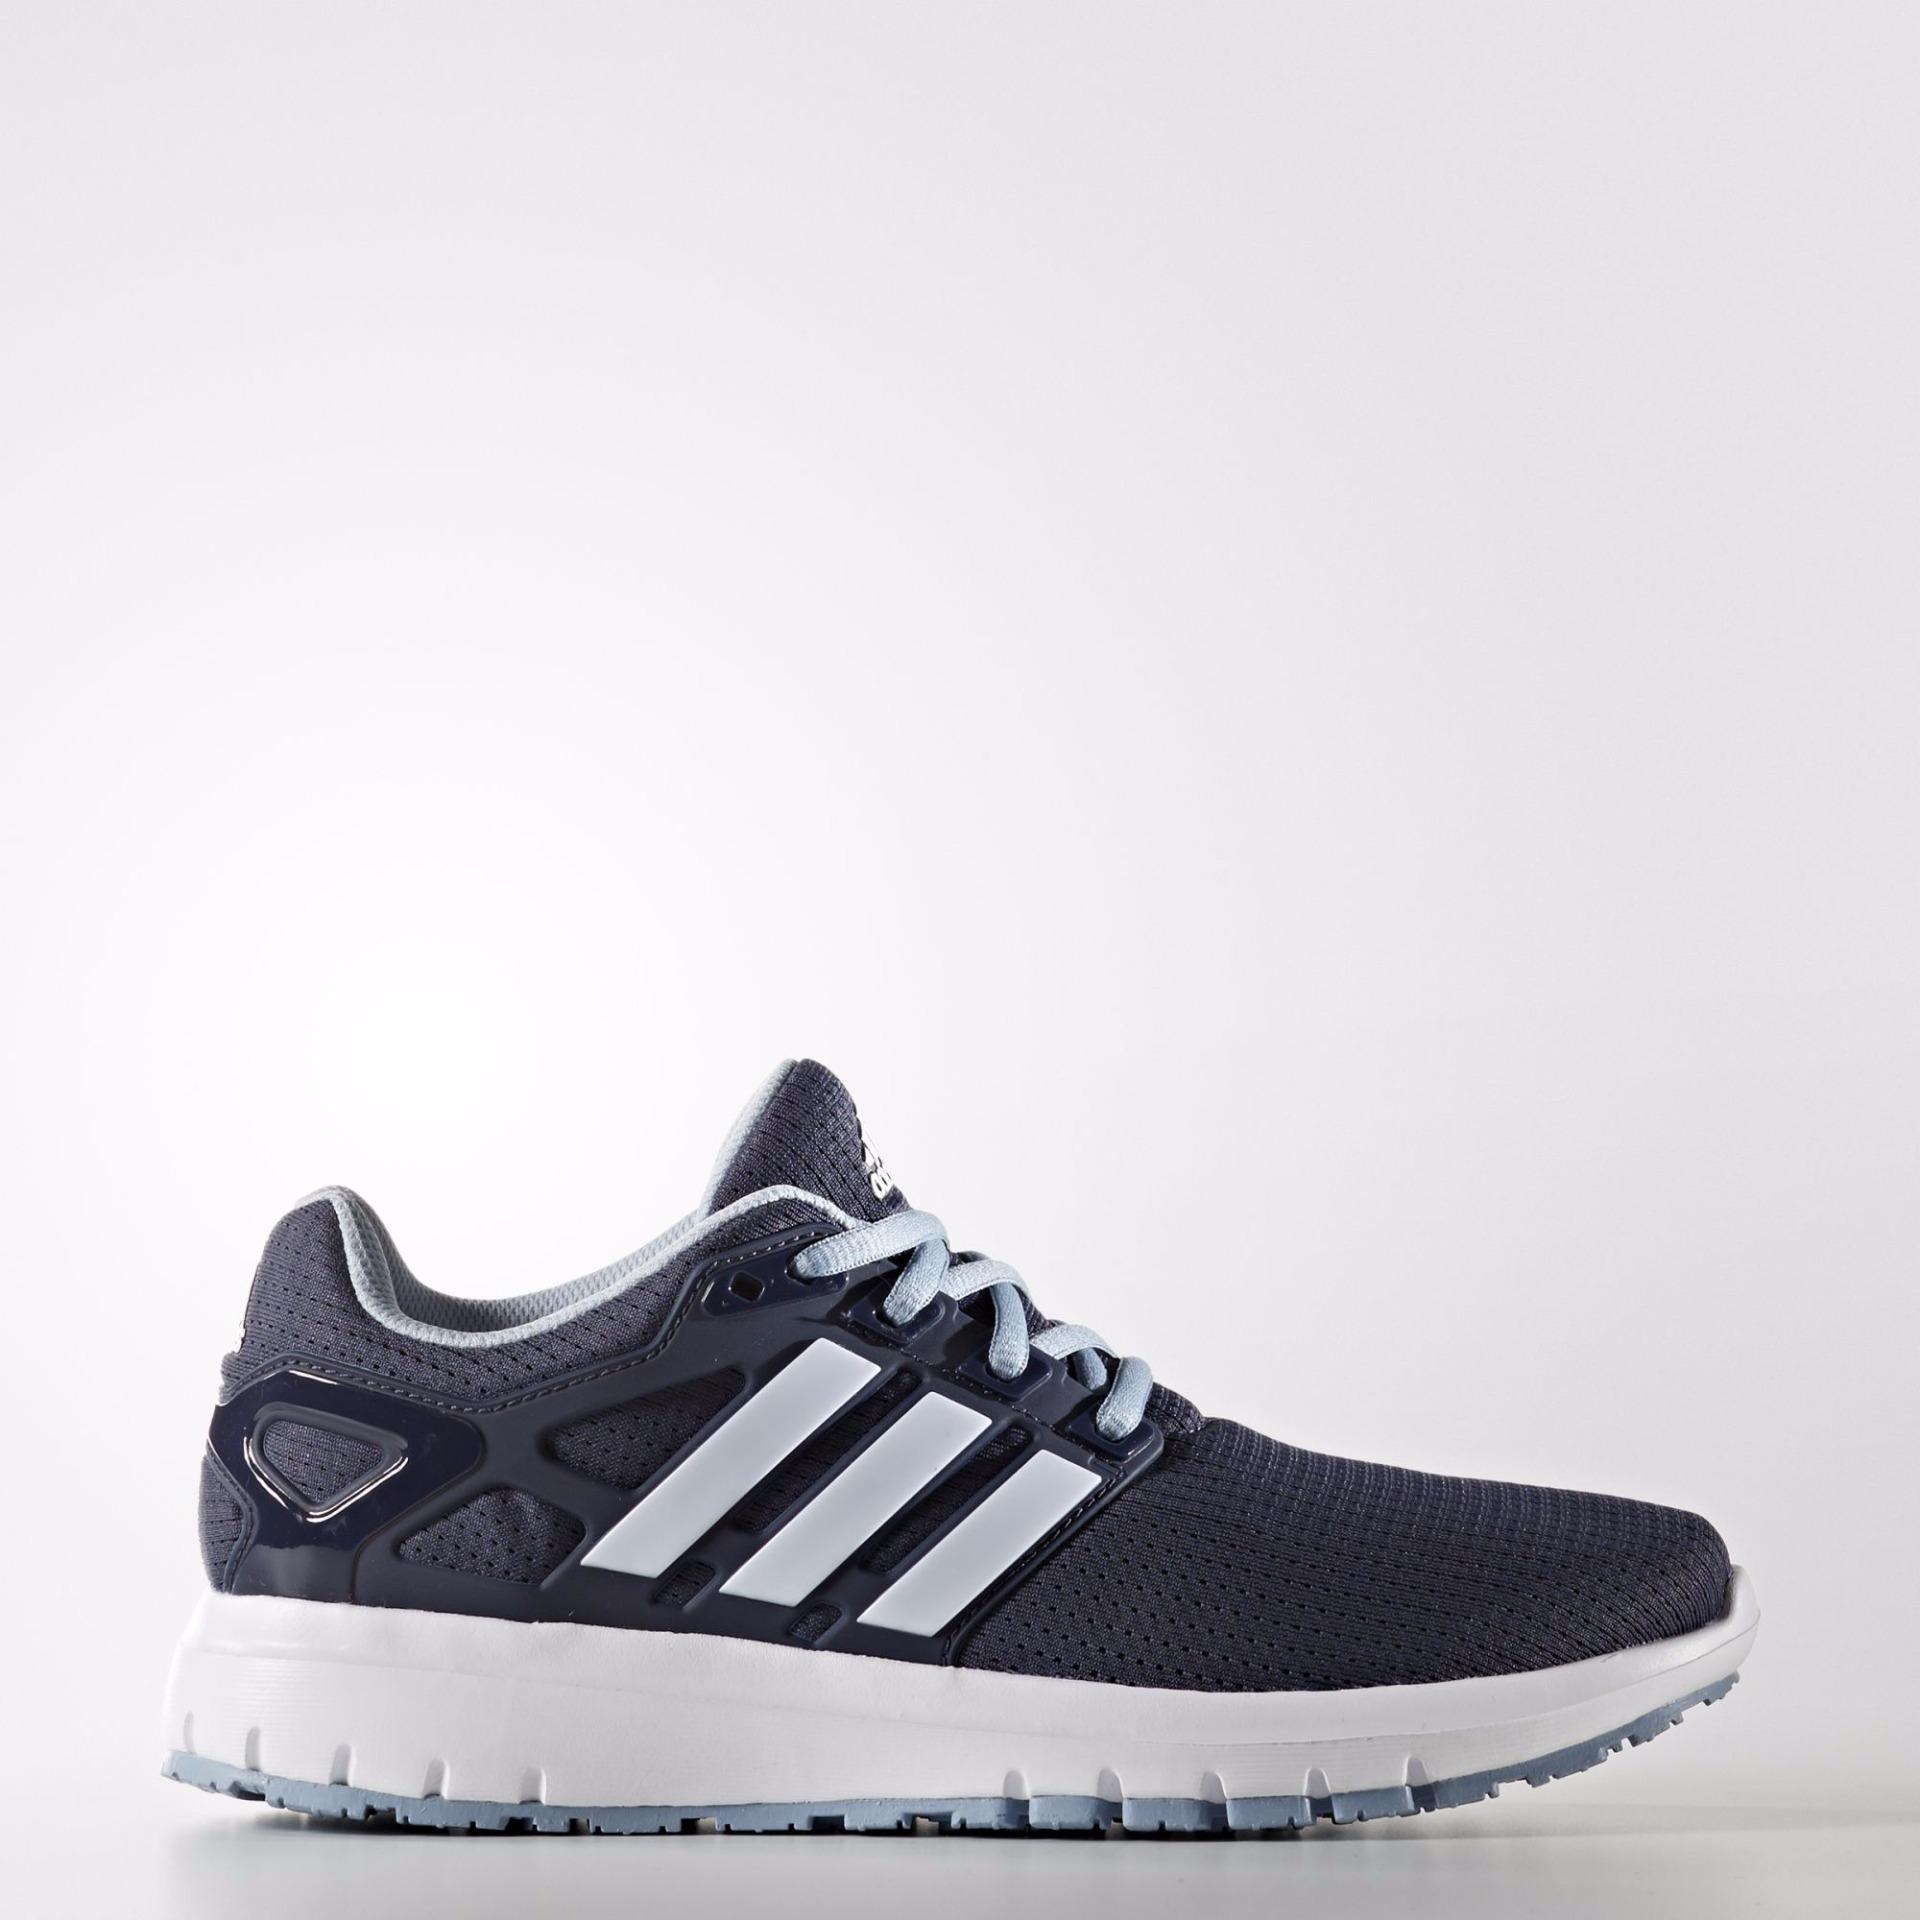 Adidas Sepatu Running Energy Cloud WTC W - BB3163 - Abu tua 1b94d313e2